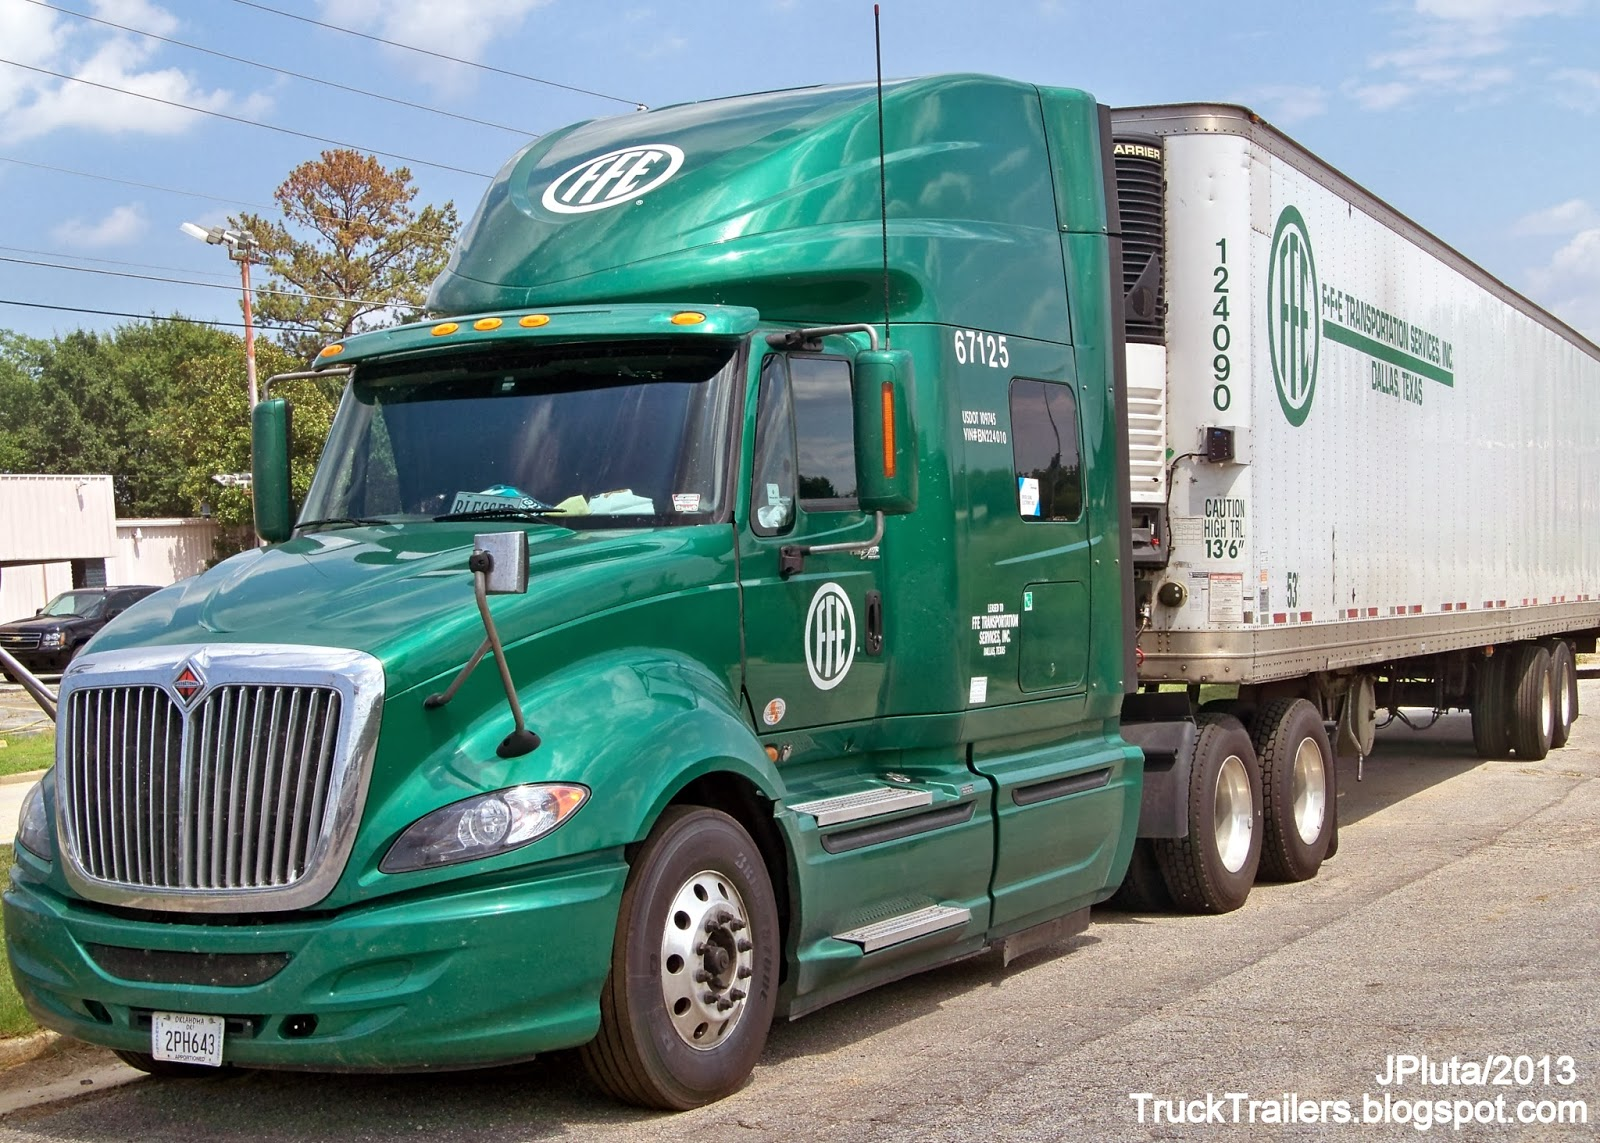 ... Trailer Truck Refrigerated Van Atlanta Georgia State Farmers Market